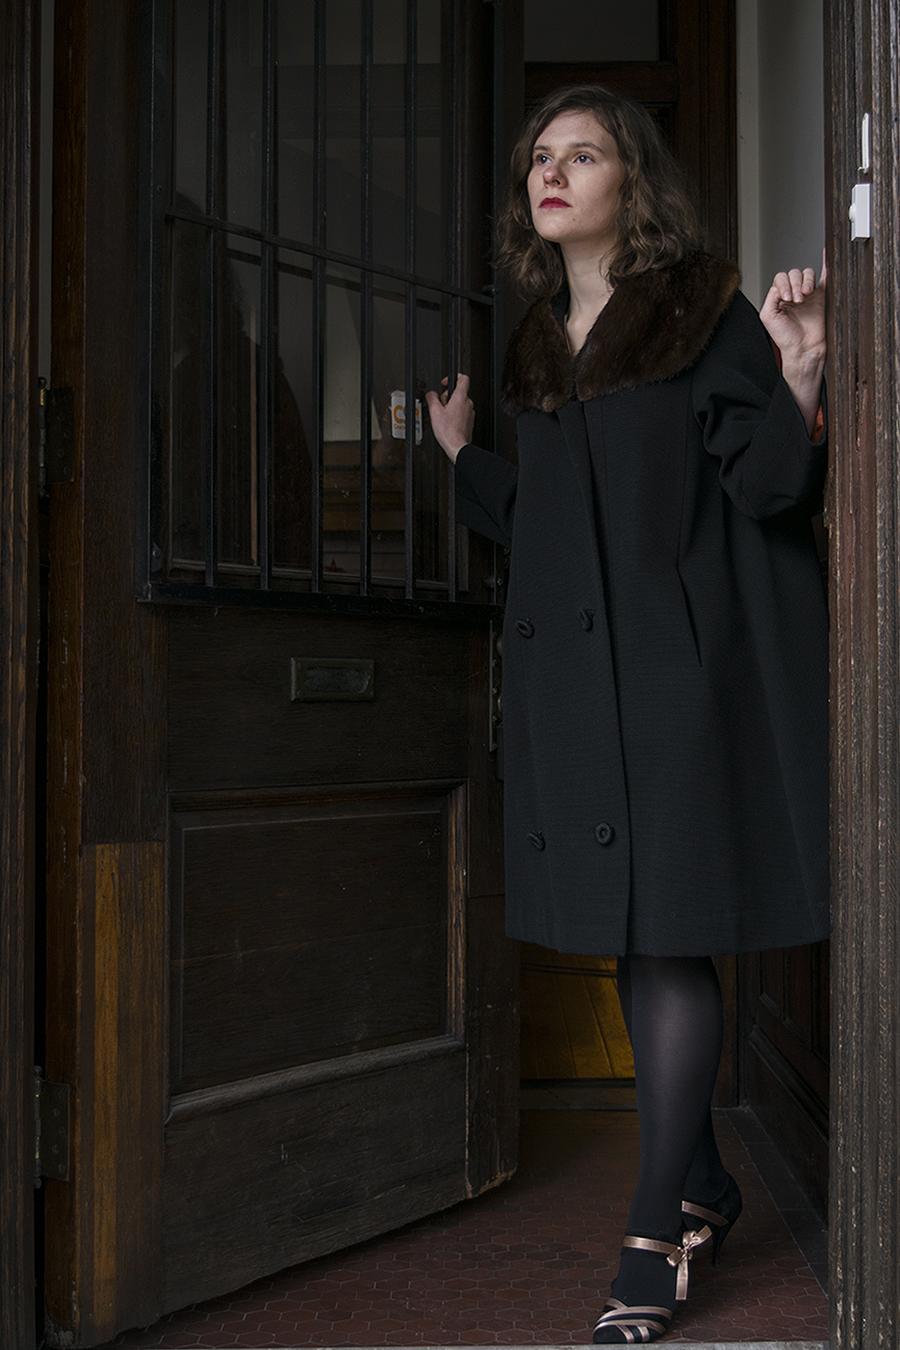 Leniqueca_Welcome_Portraiture_Lise_JeSuis_Desolate_Distant_Love_Longing_Fullbody_Doorway_longing